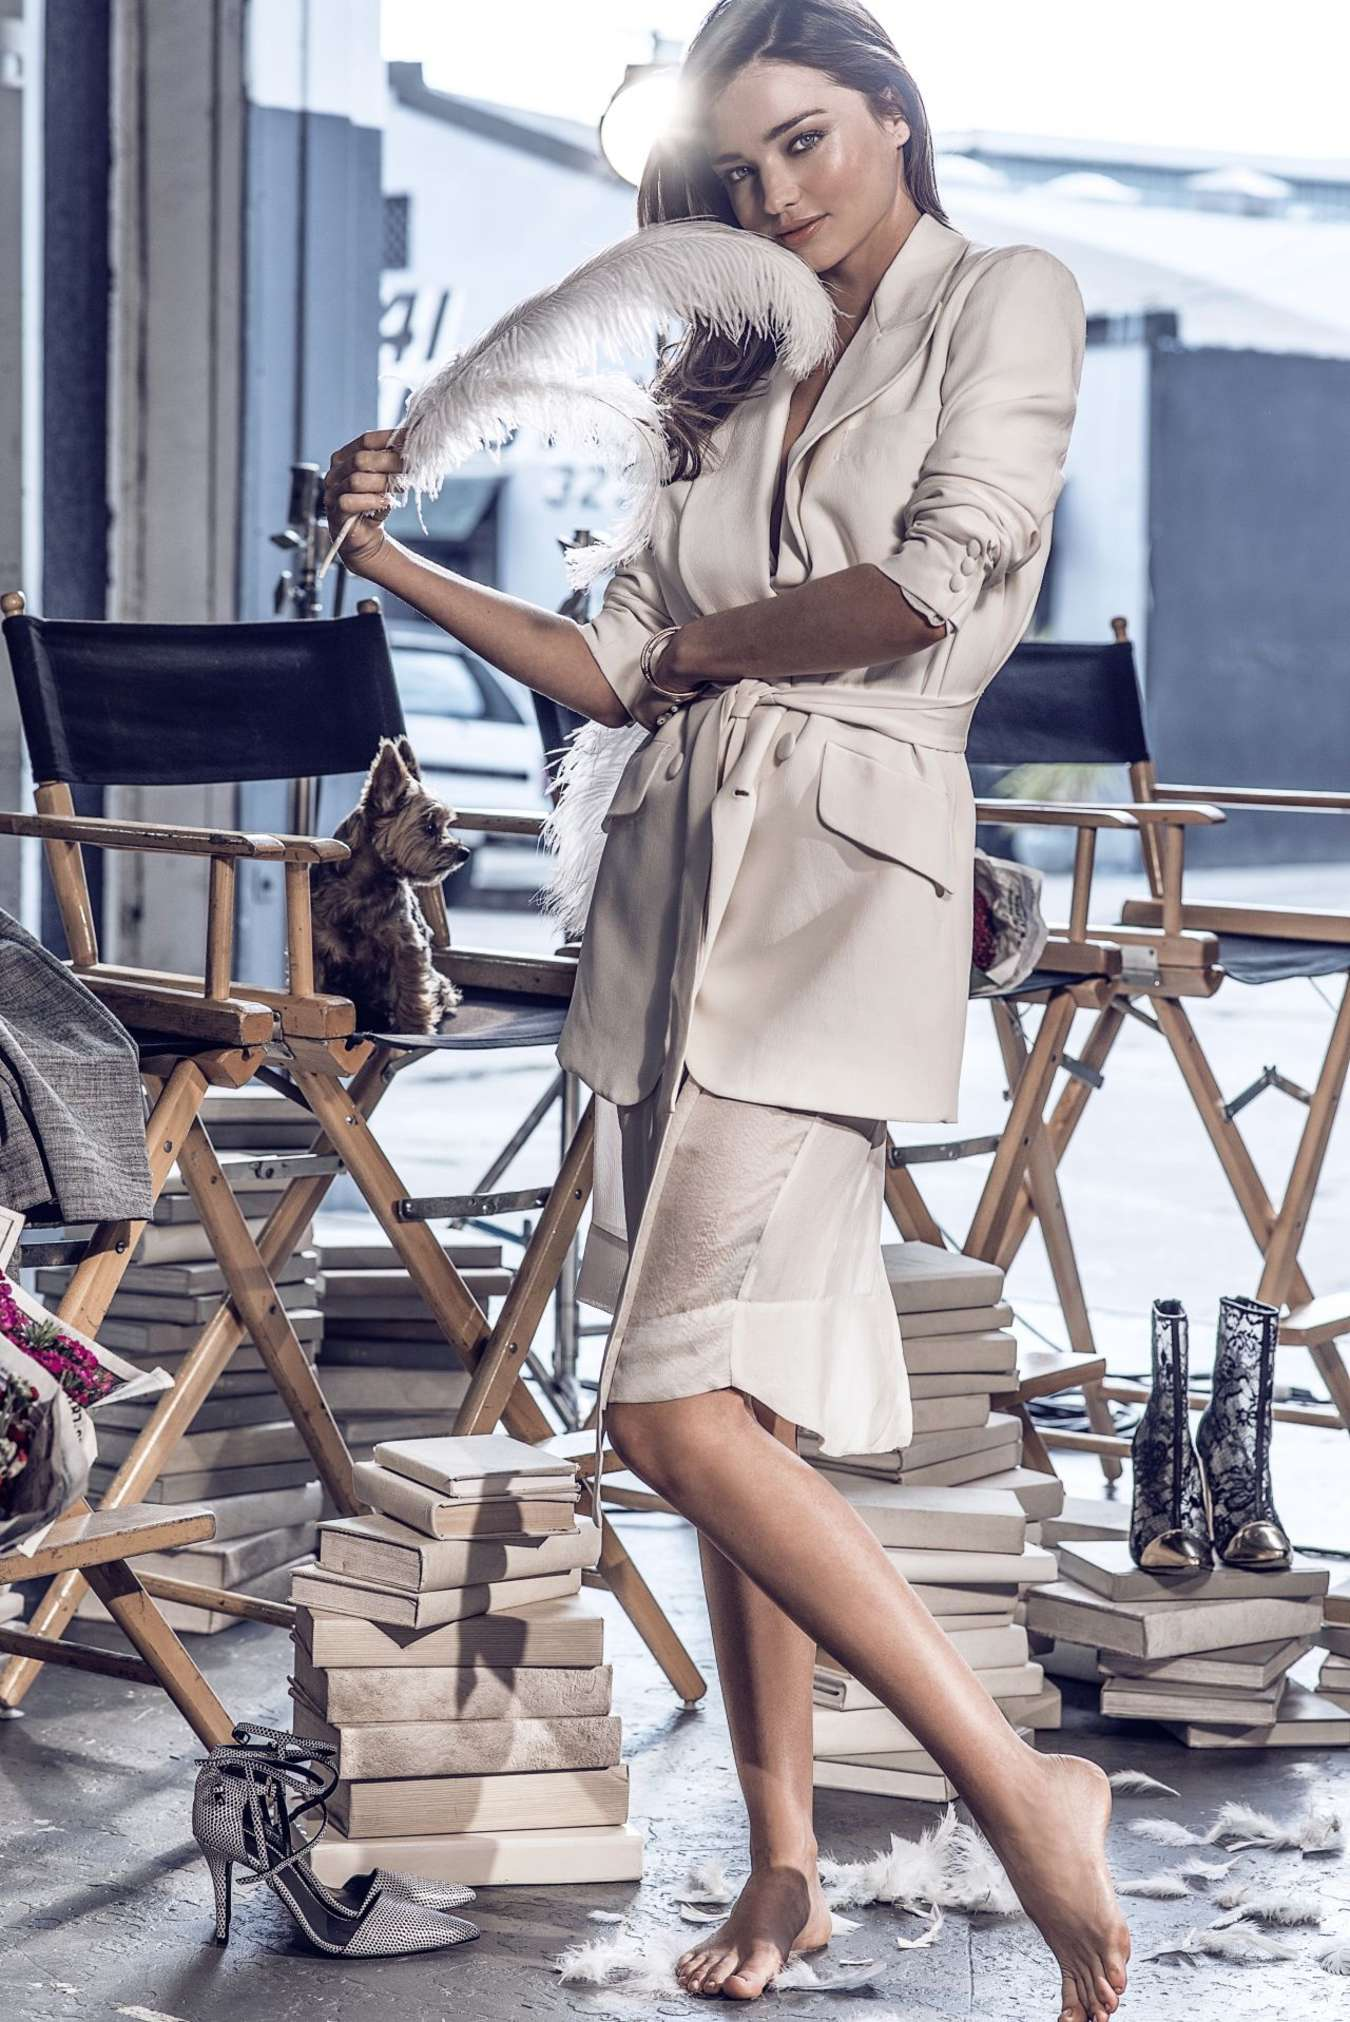 Miranda Kerr 2015 : Miranda Kerr: Swarovski Holiday 2015 Collection -02